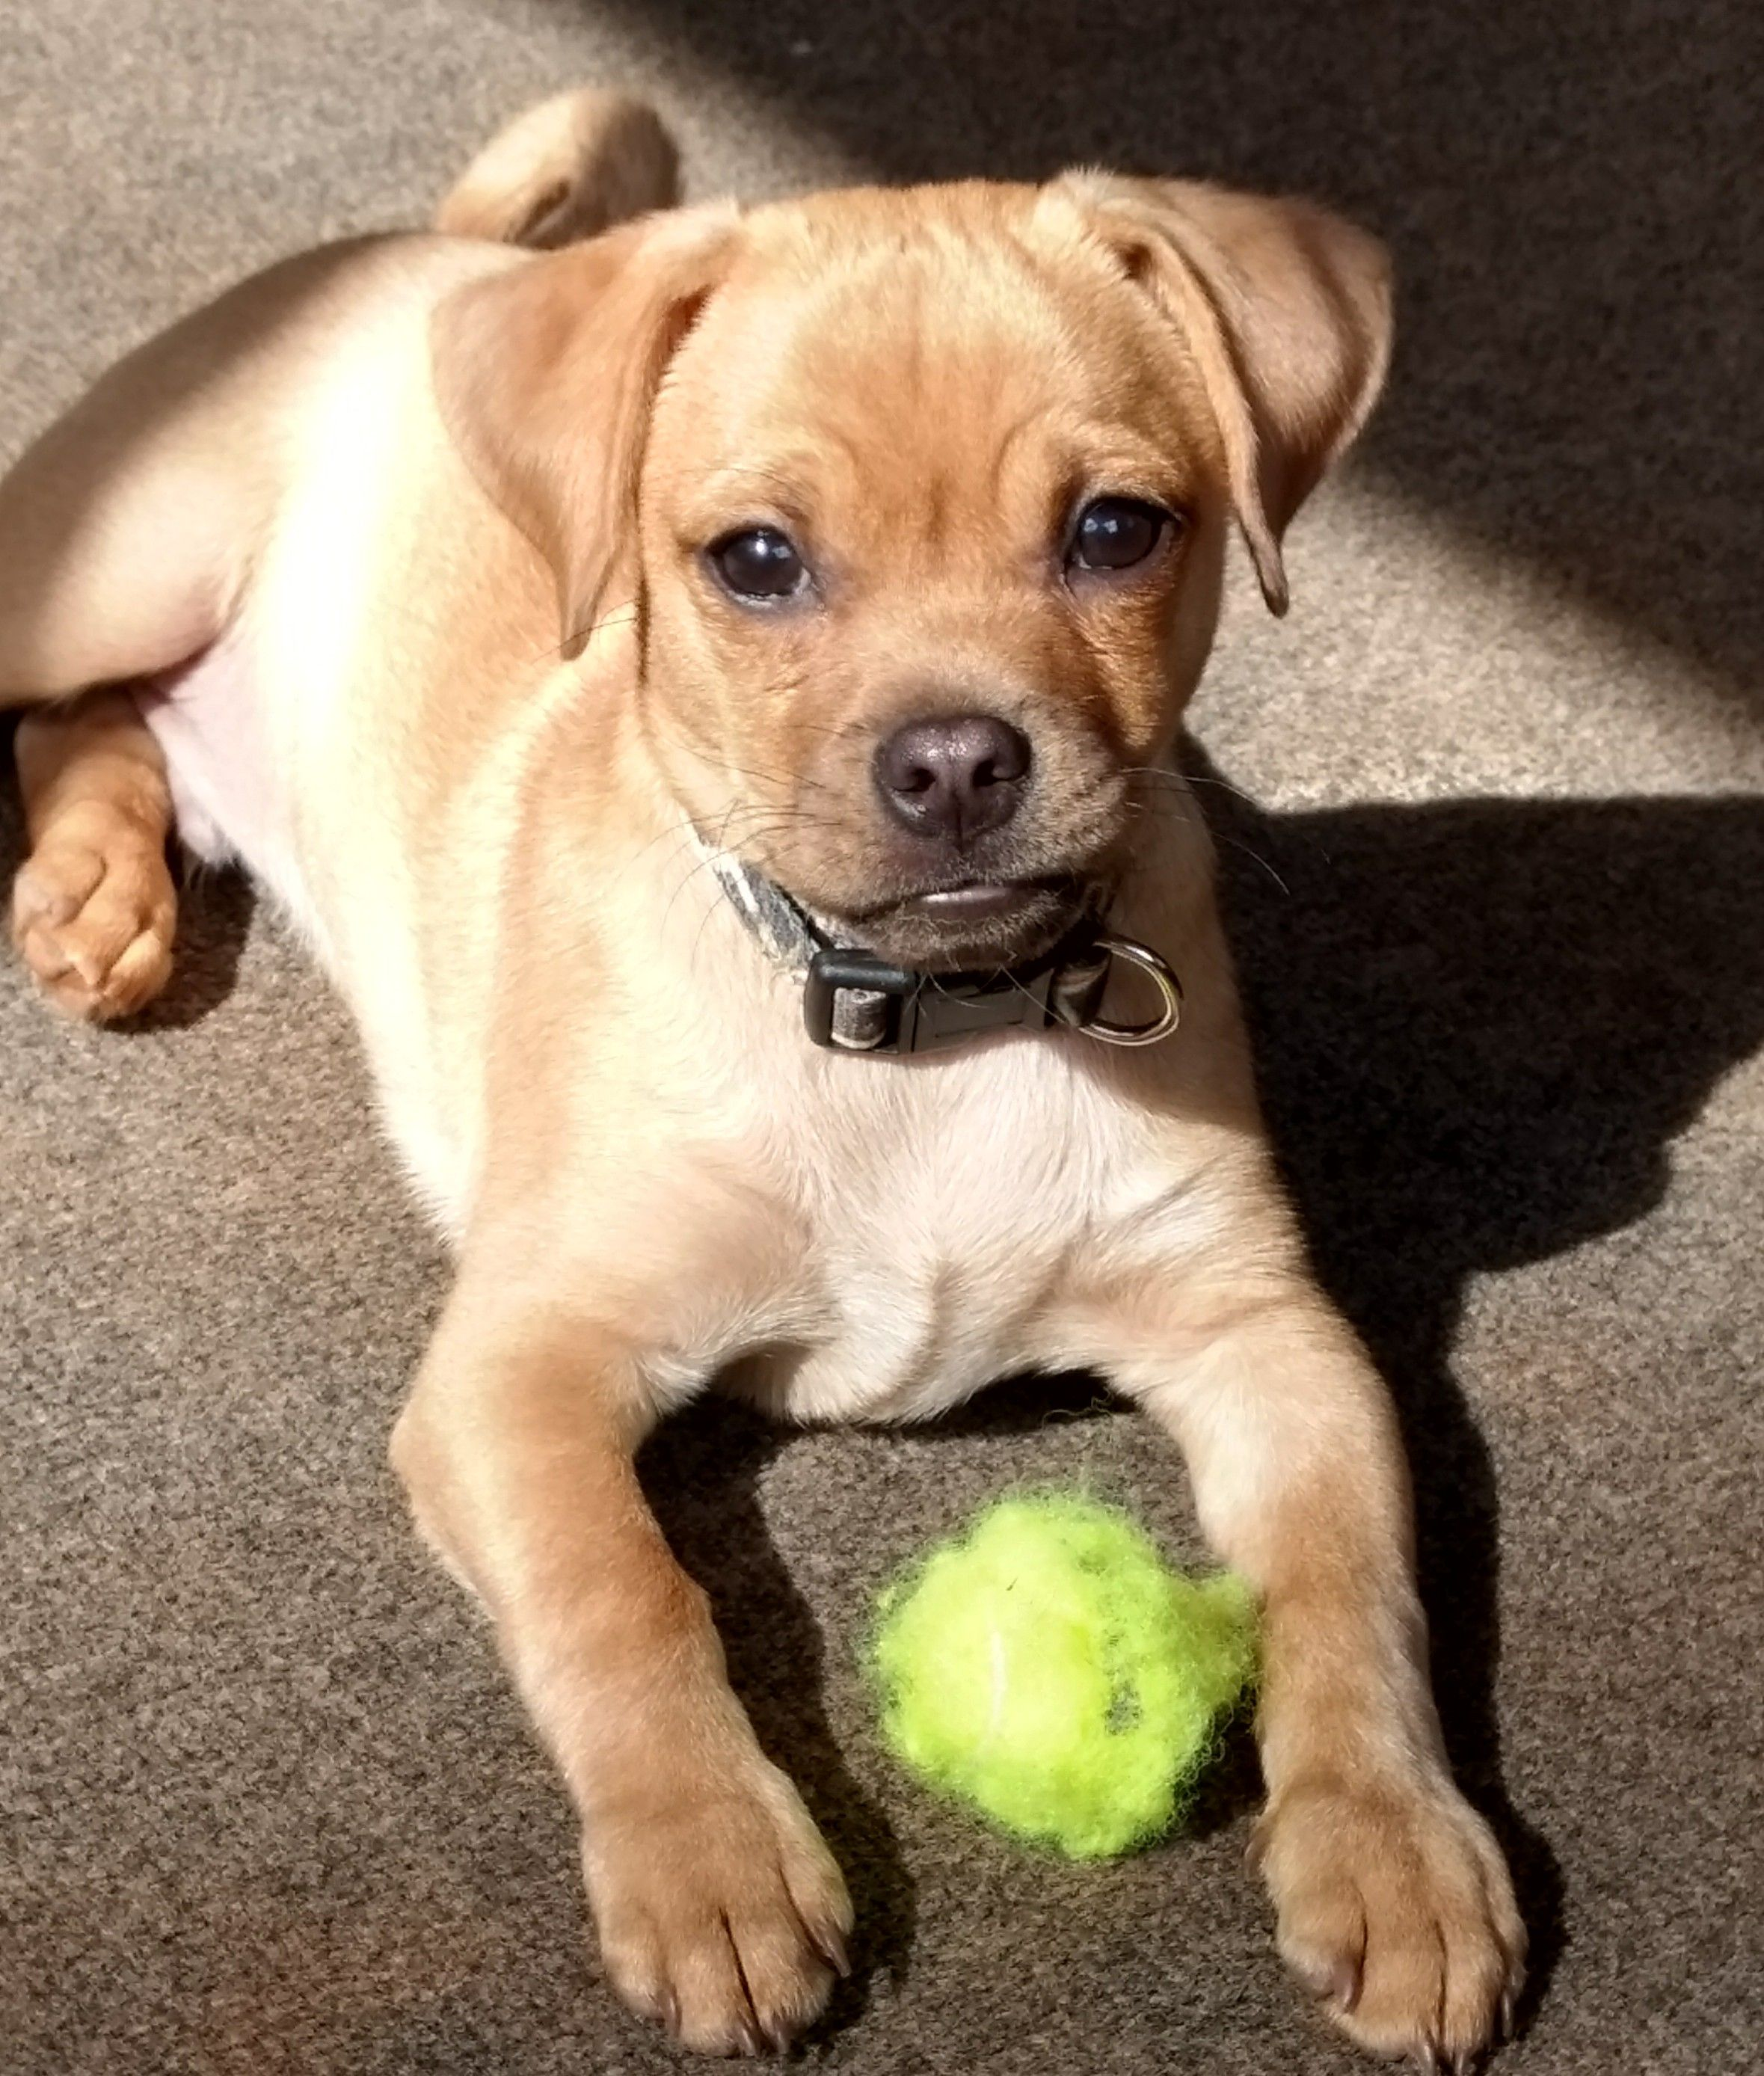 Gabbo Is A Chihuahua Pug Cross Cute Chihuahua Chihuahua Funny